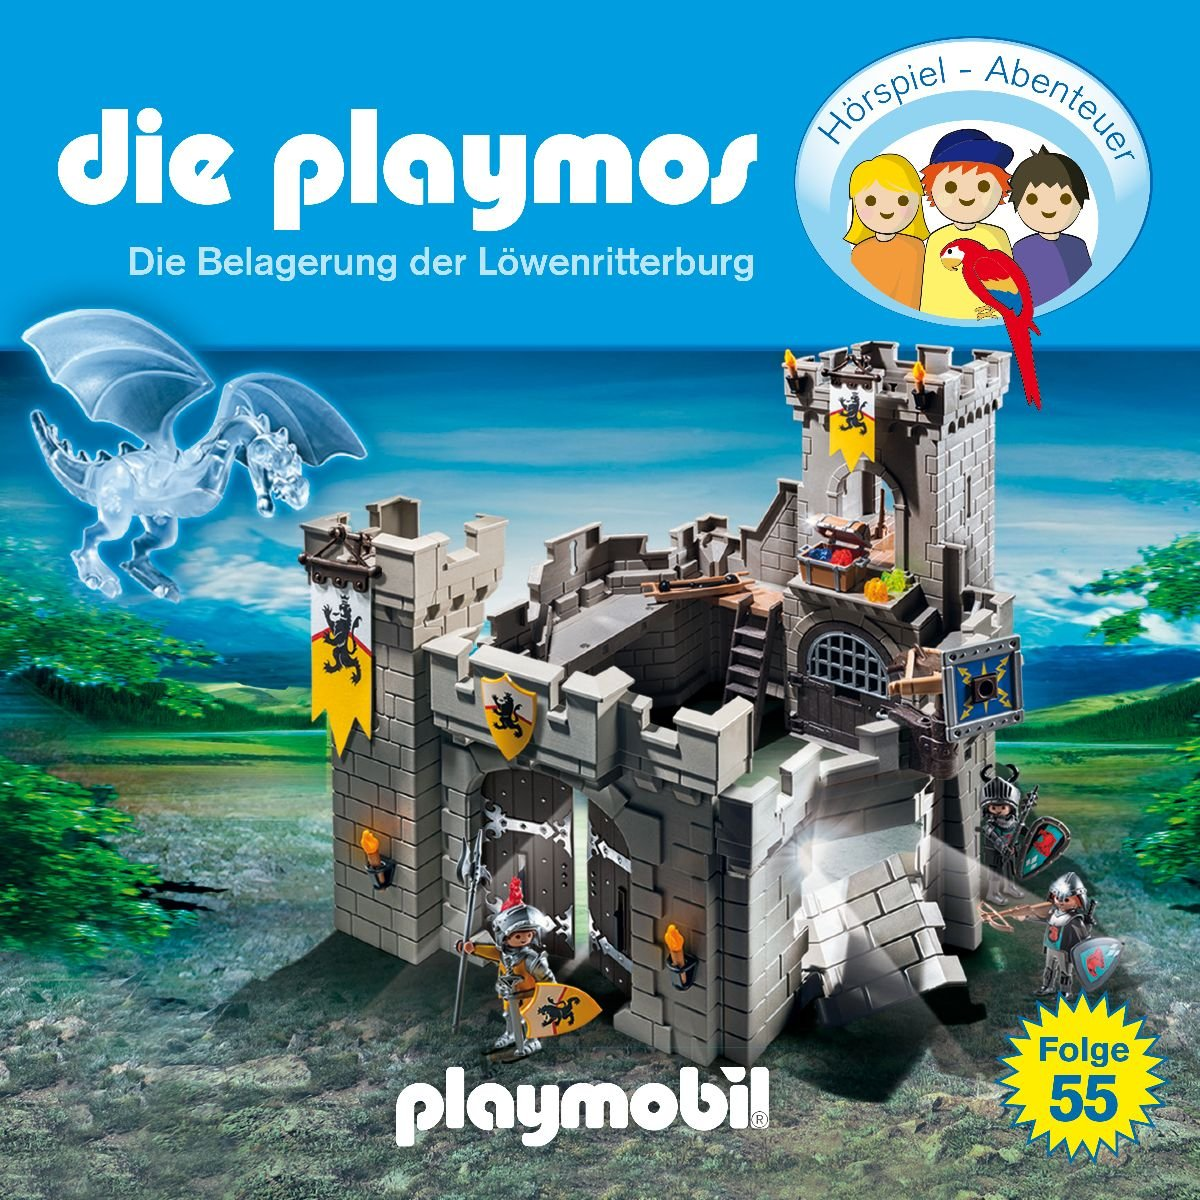 Die Playmos (55) Die Belagerung der Löwenritterburg - floff publishing 2017